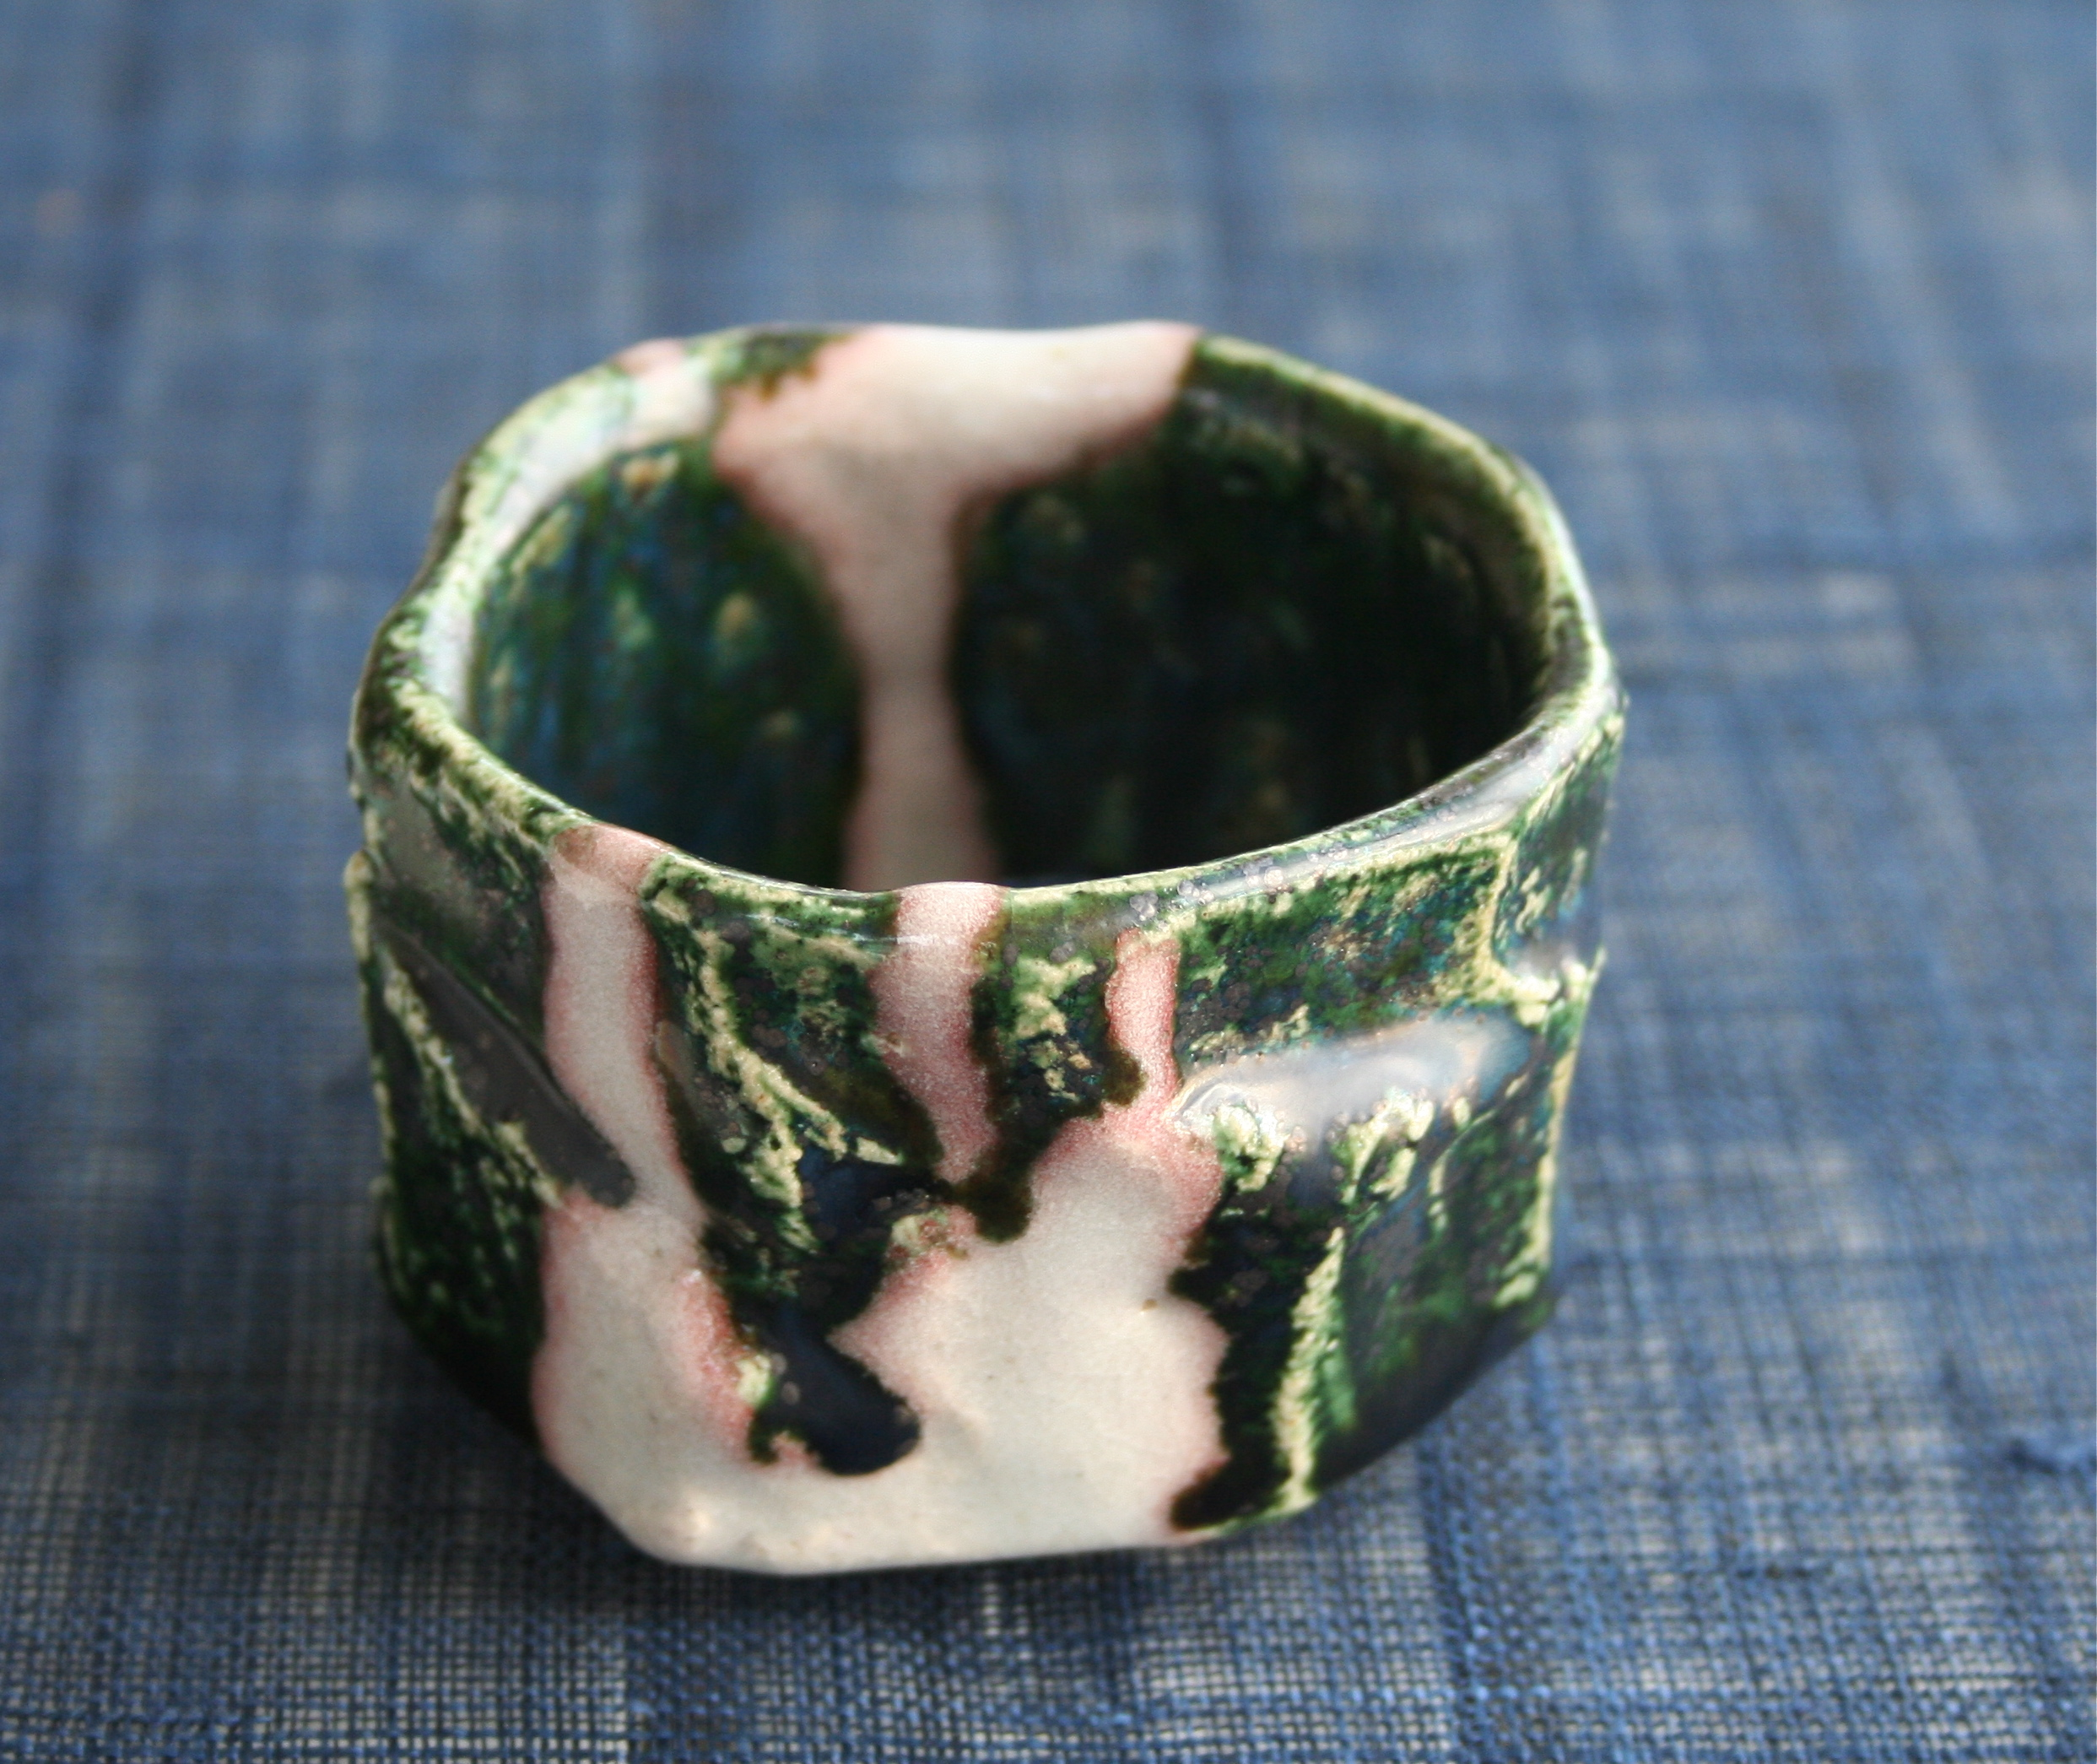 sake cup by Kouchi Hidetoshi